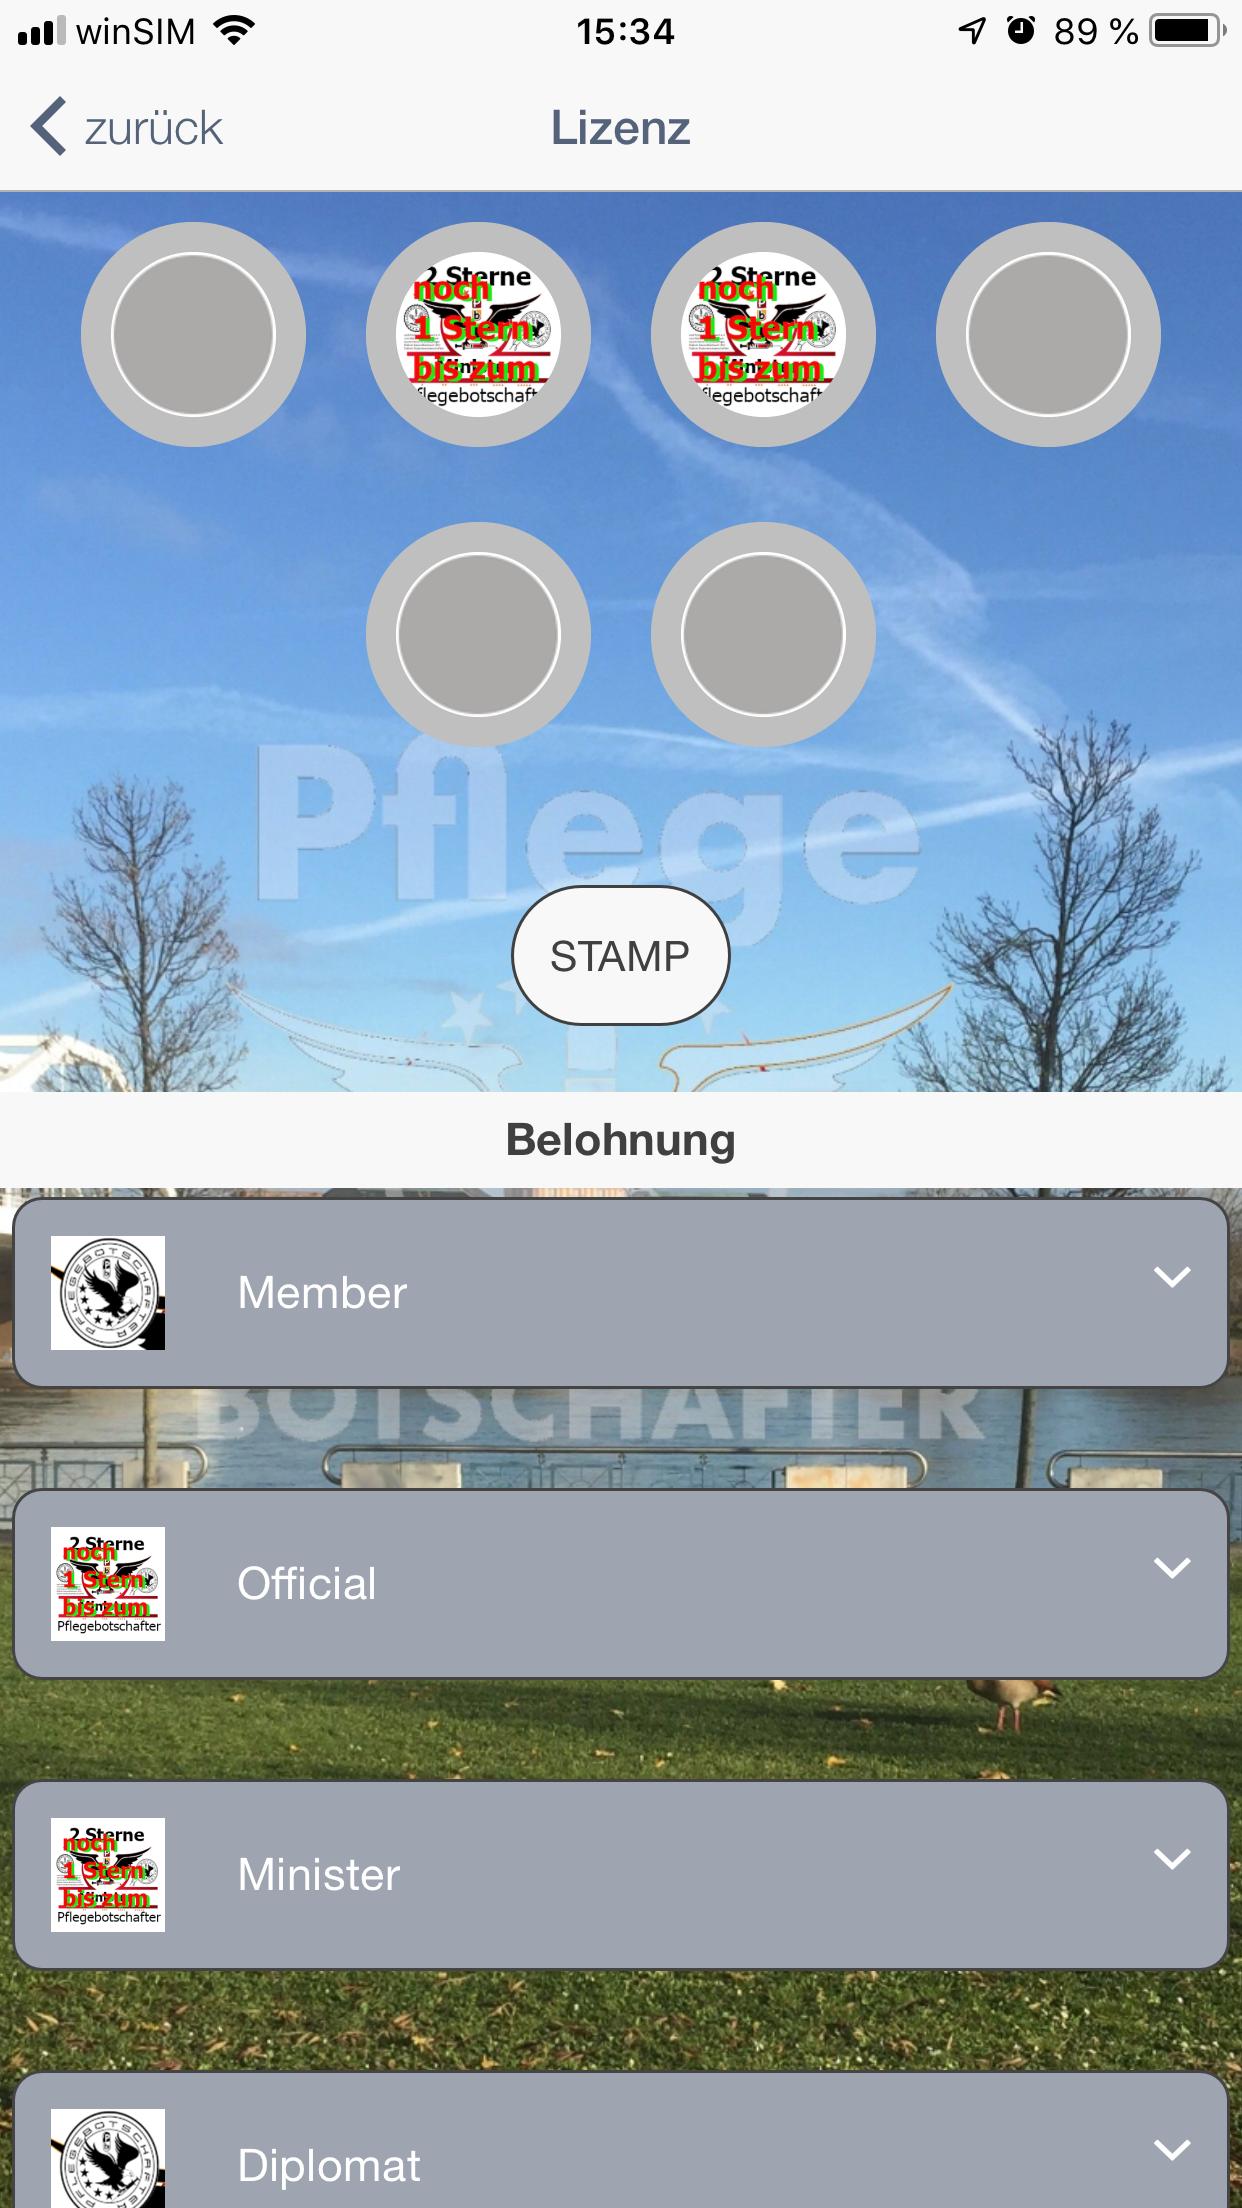 SpringerCard